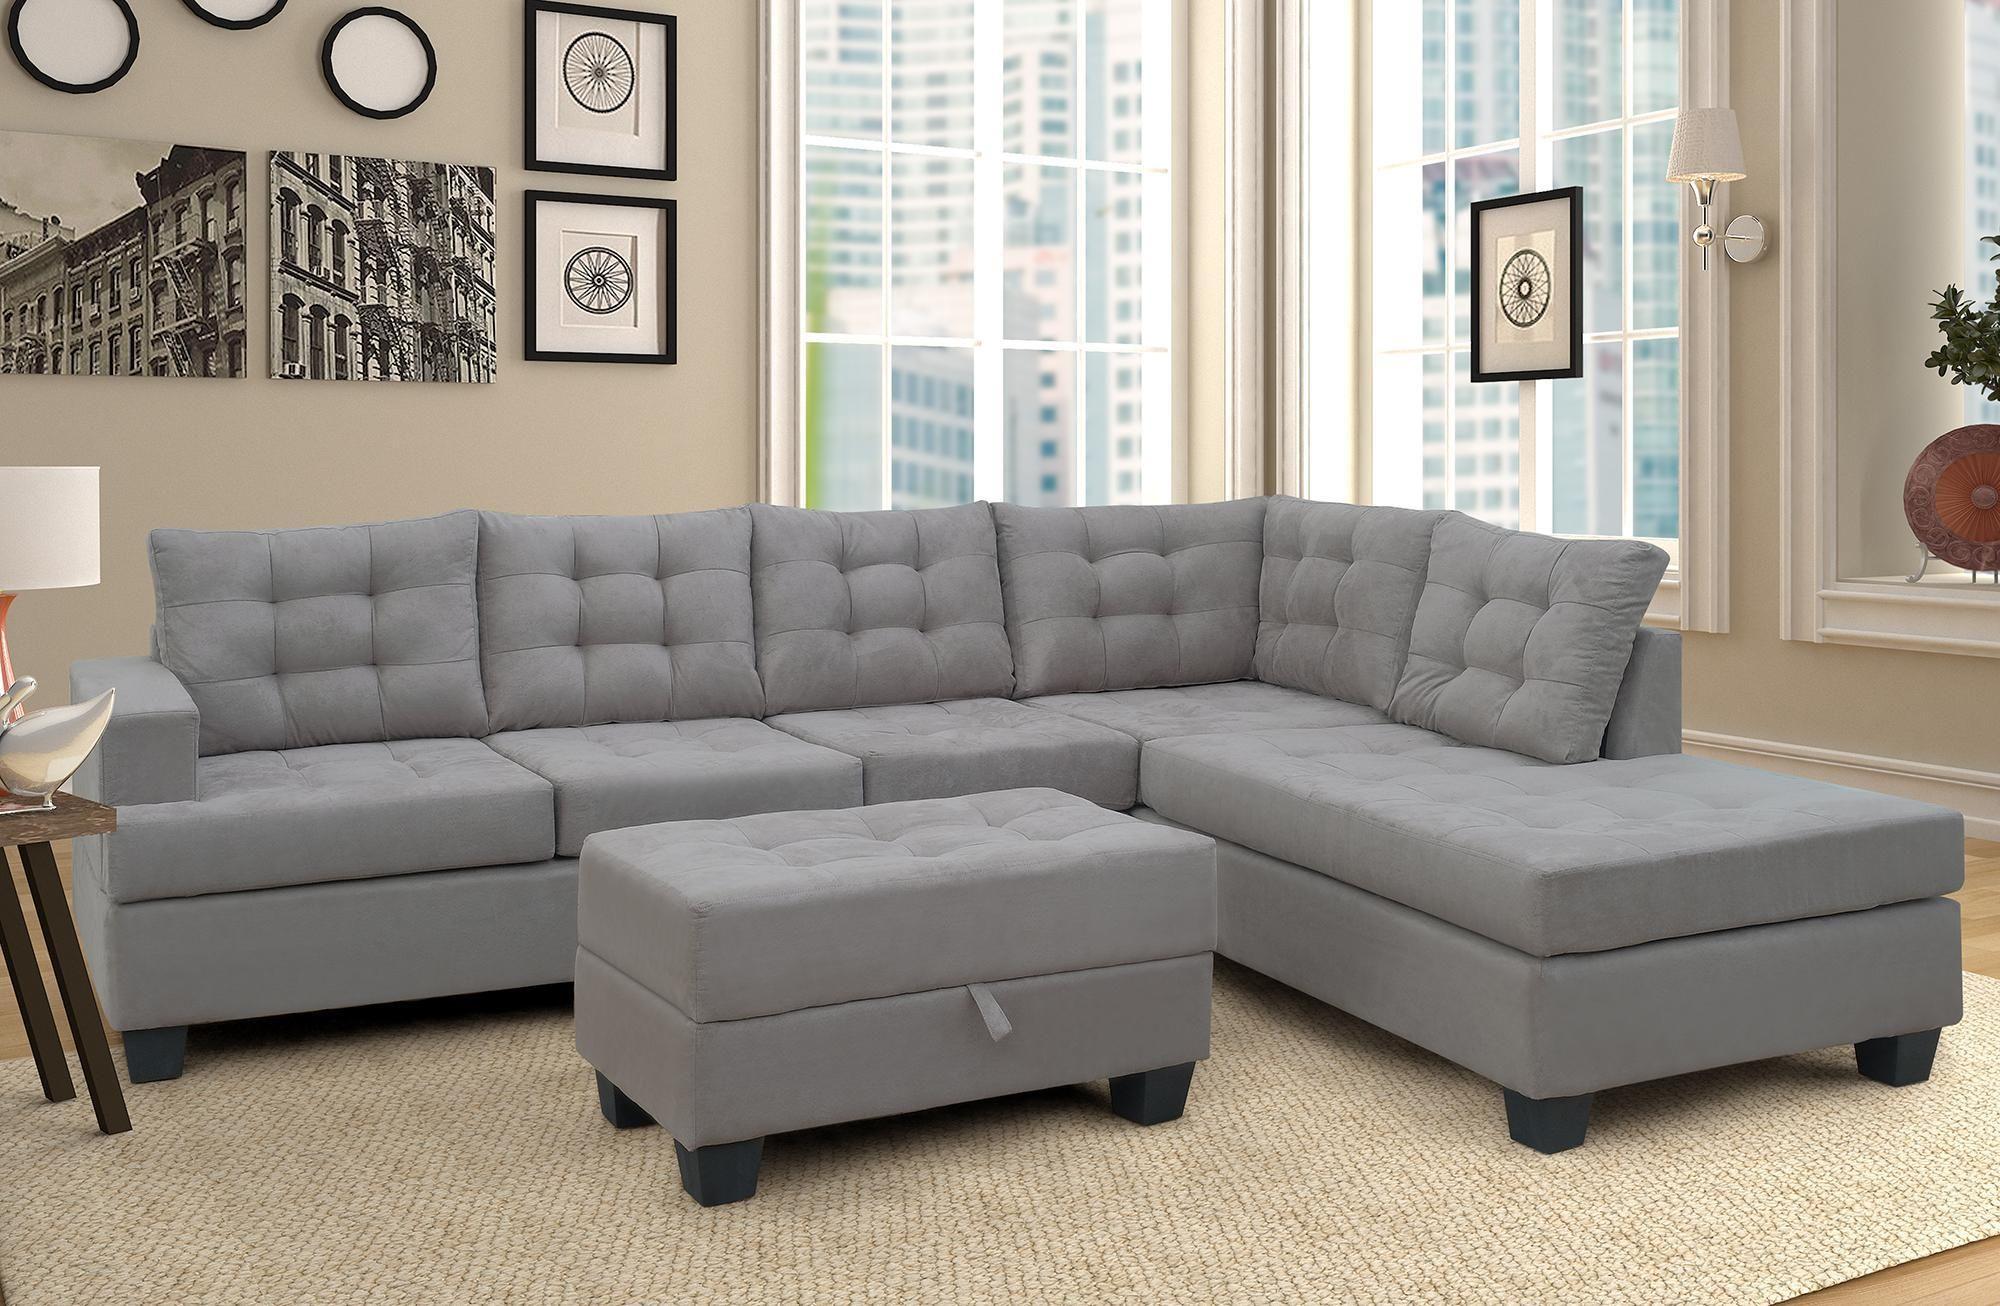 US Stock, Chaise Lounge 및 Storage Ottoman L Shape 소파 소파 거실 가구 (회색) SM000049EAA